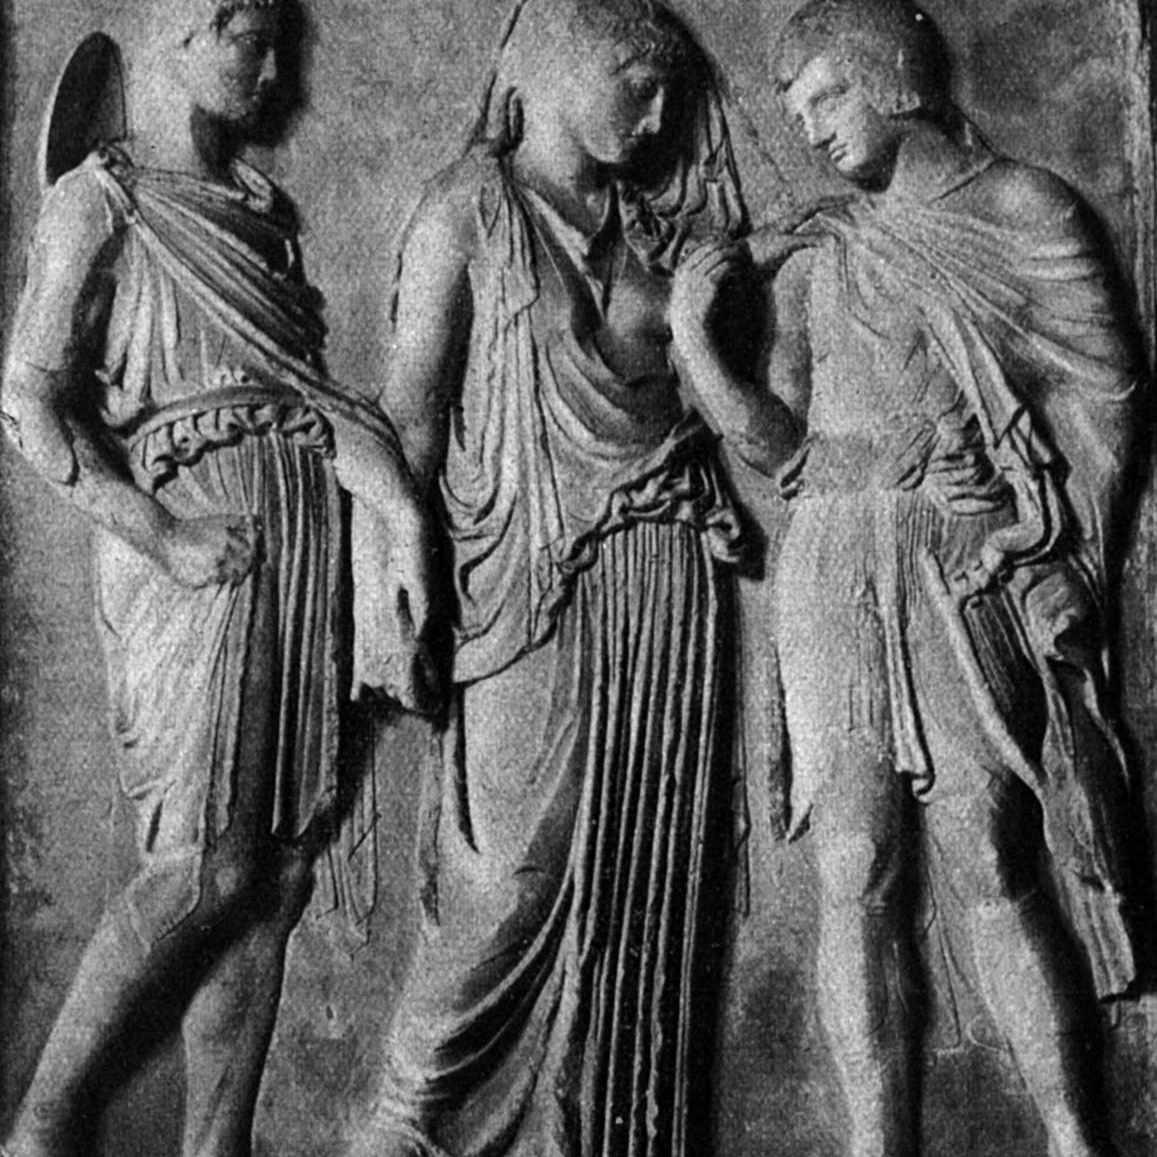 Hermes, Orpheus and Eurydice